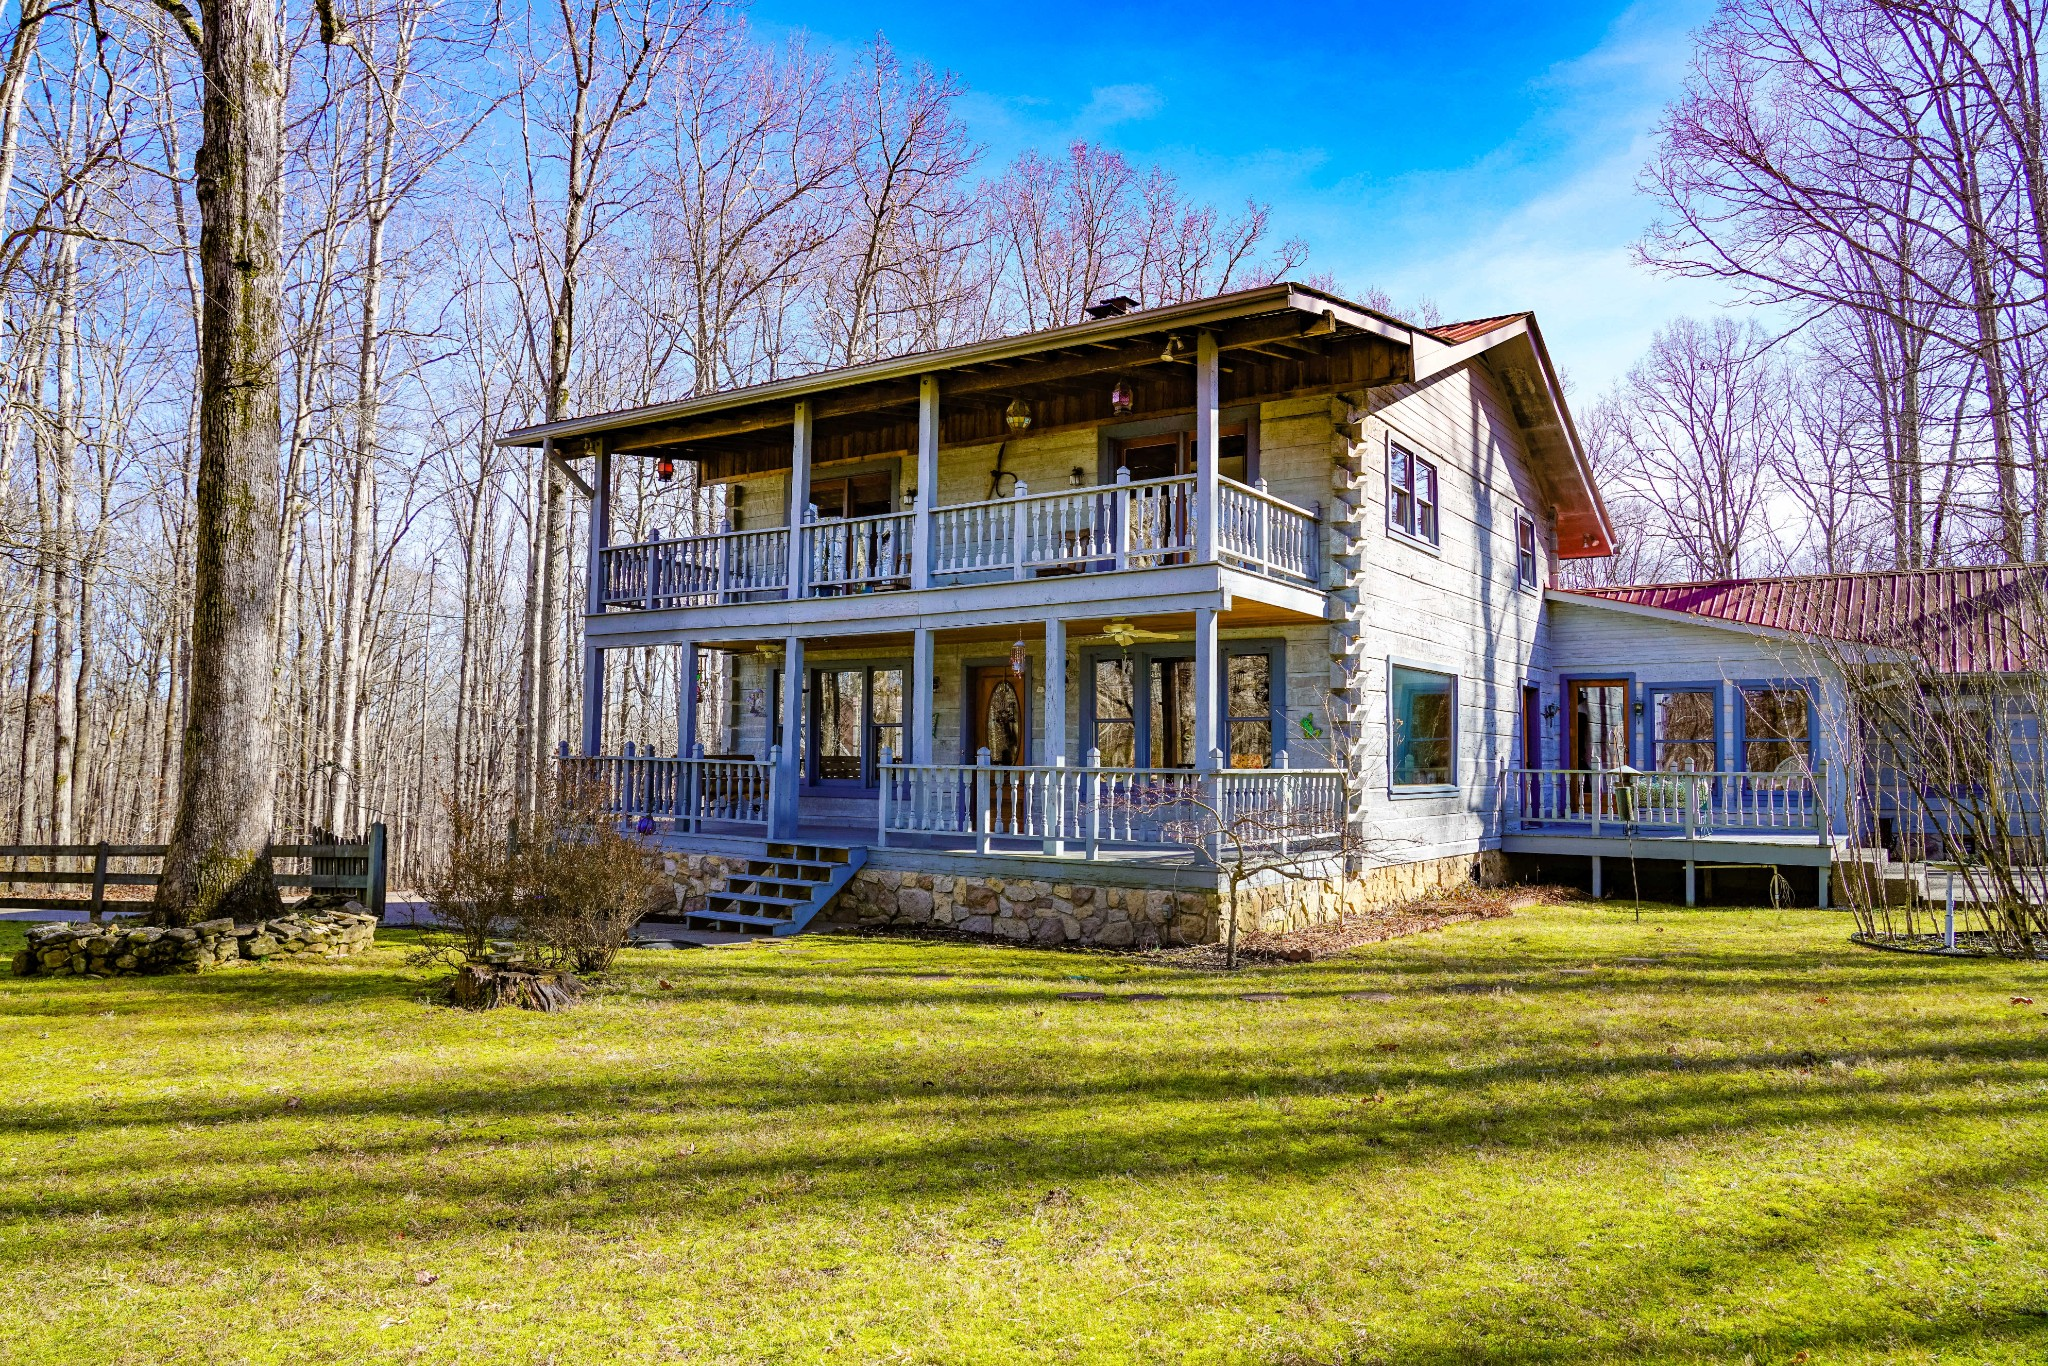 1145 Wildlife Trl, Kingston Springs, TN 37082 - Kingston Springs, TN real estate listing